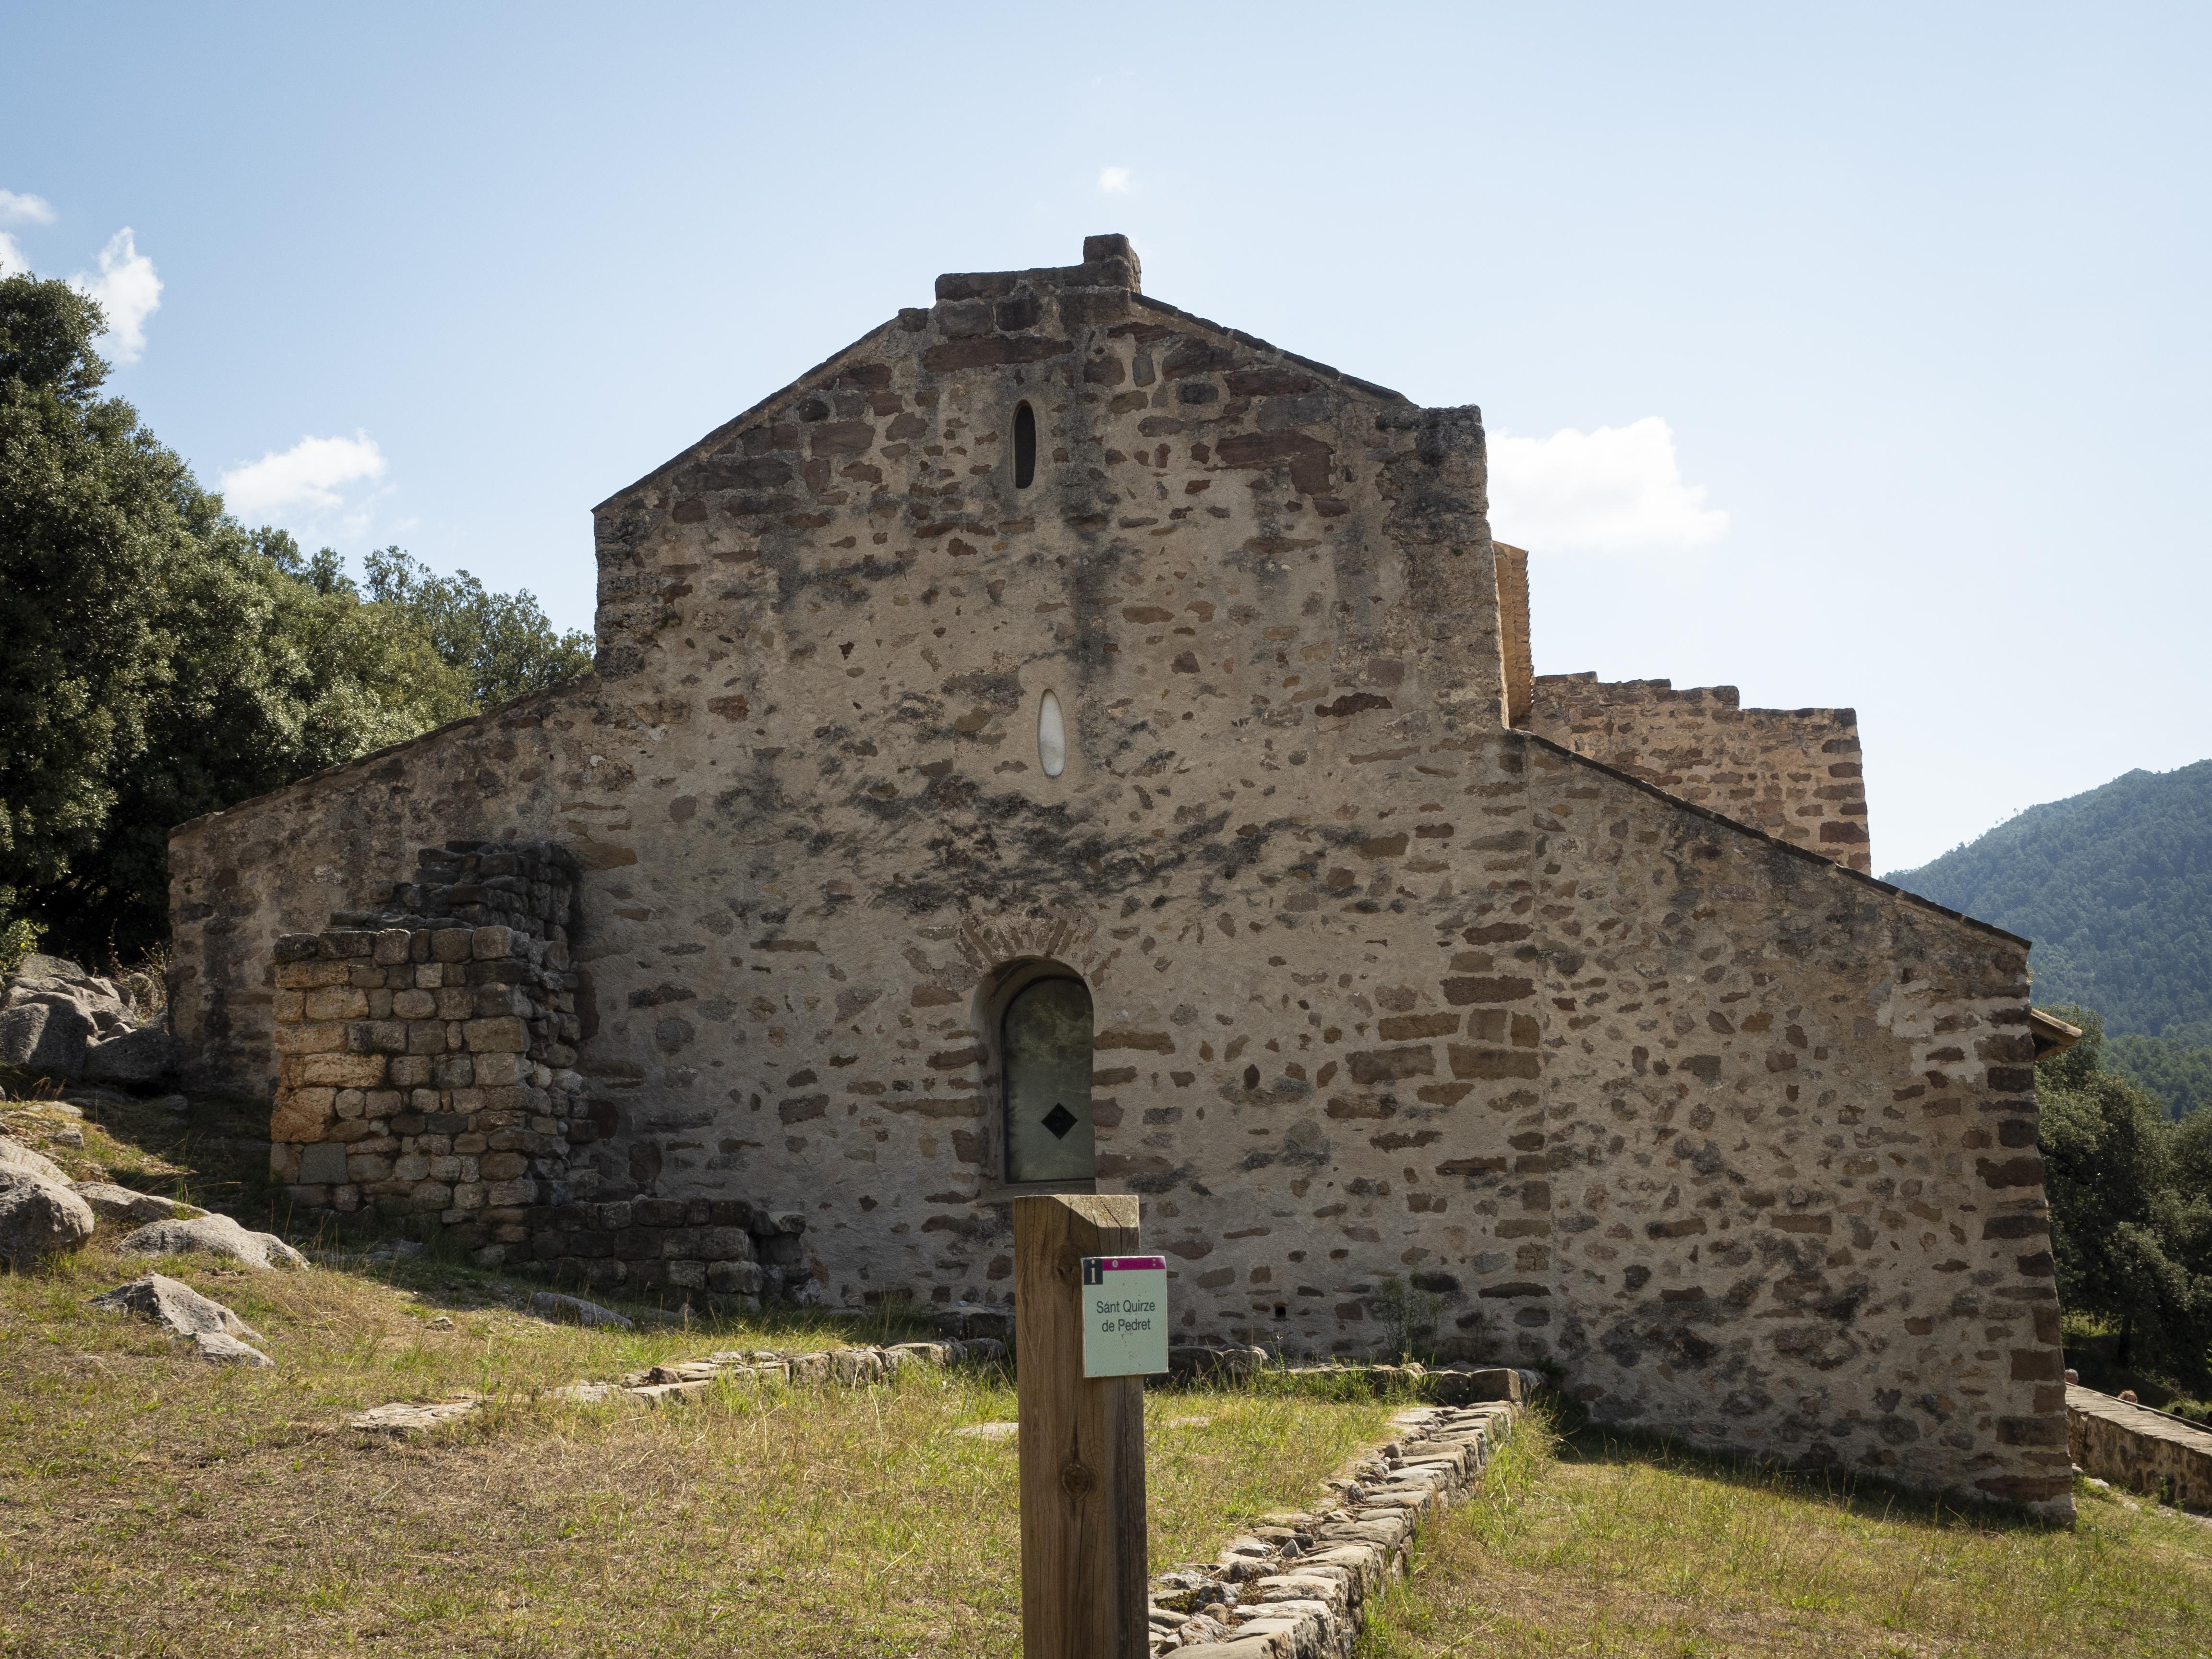 Església de Sant Quirze de Pedret. FOTO: Anna E. Puig